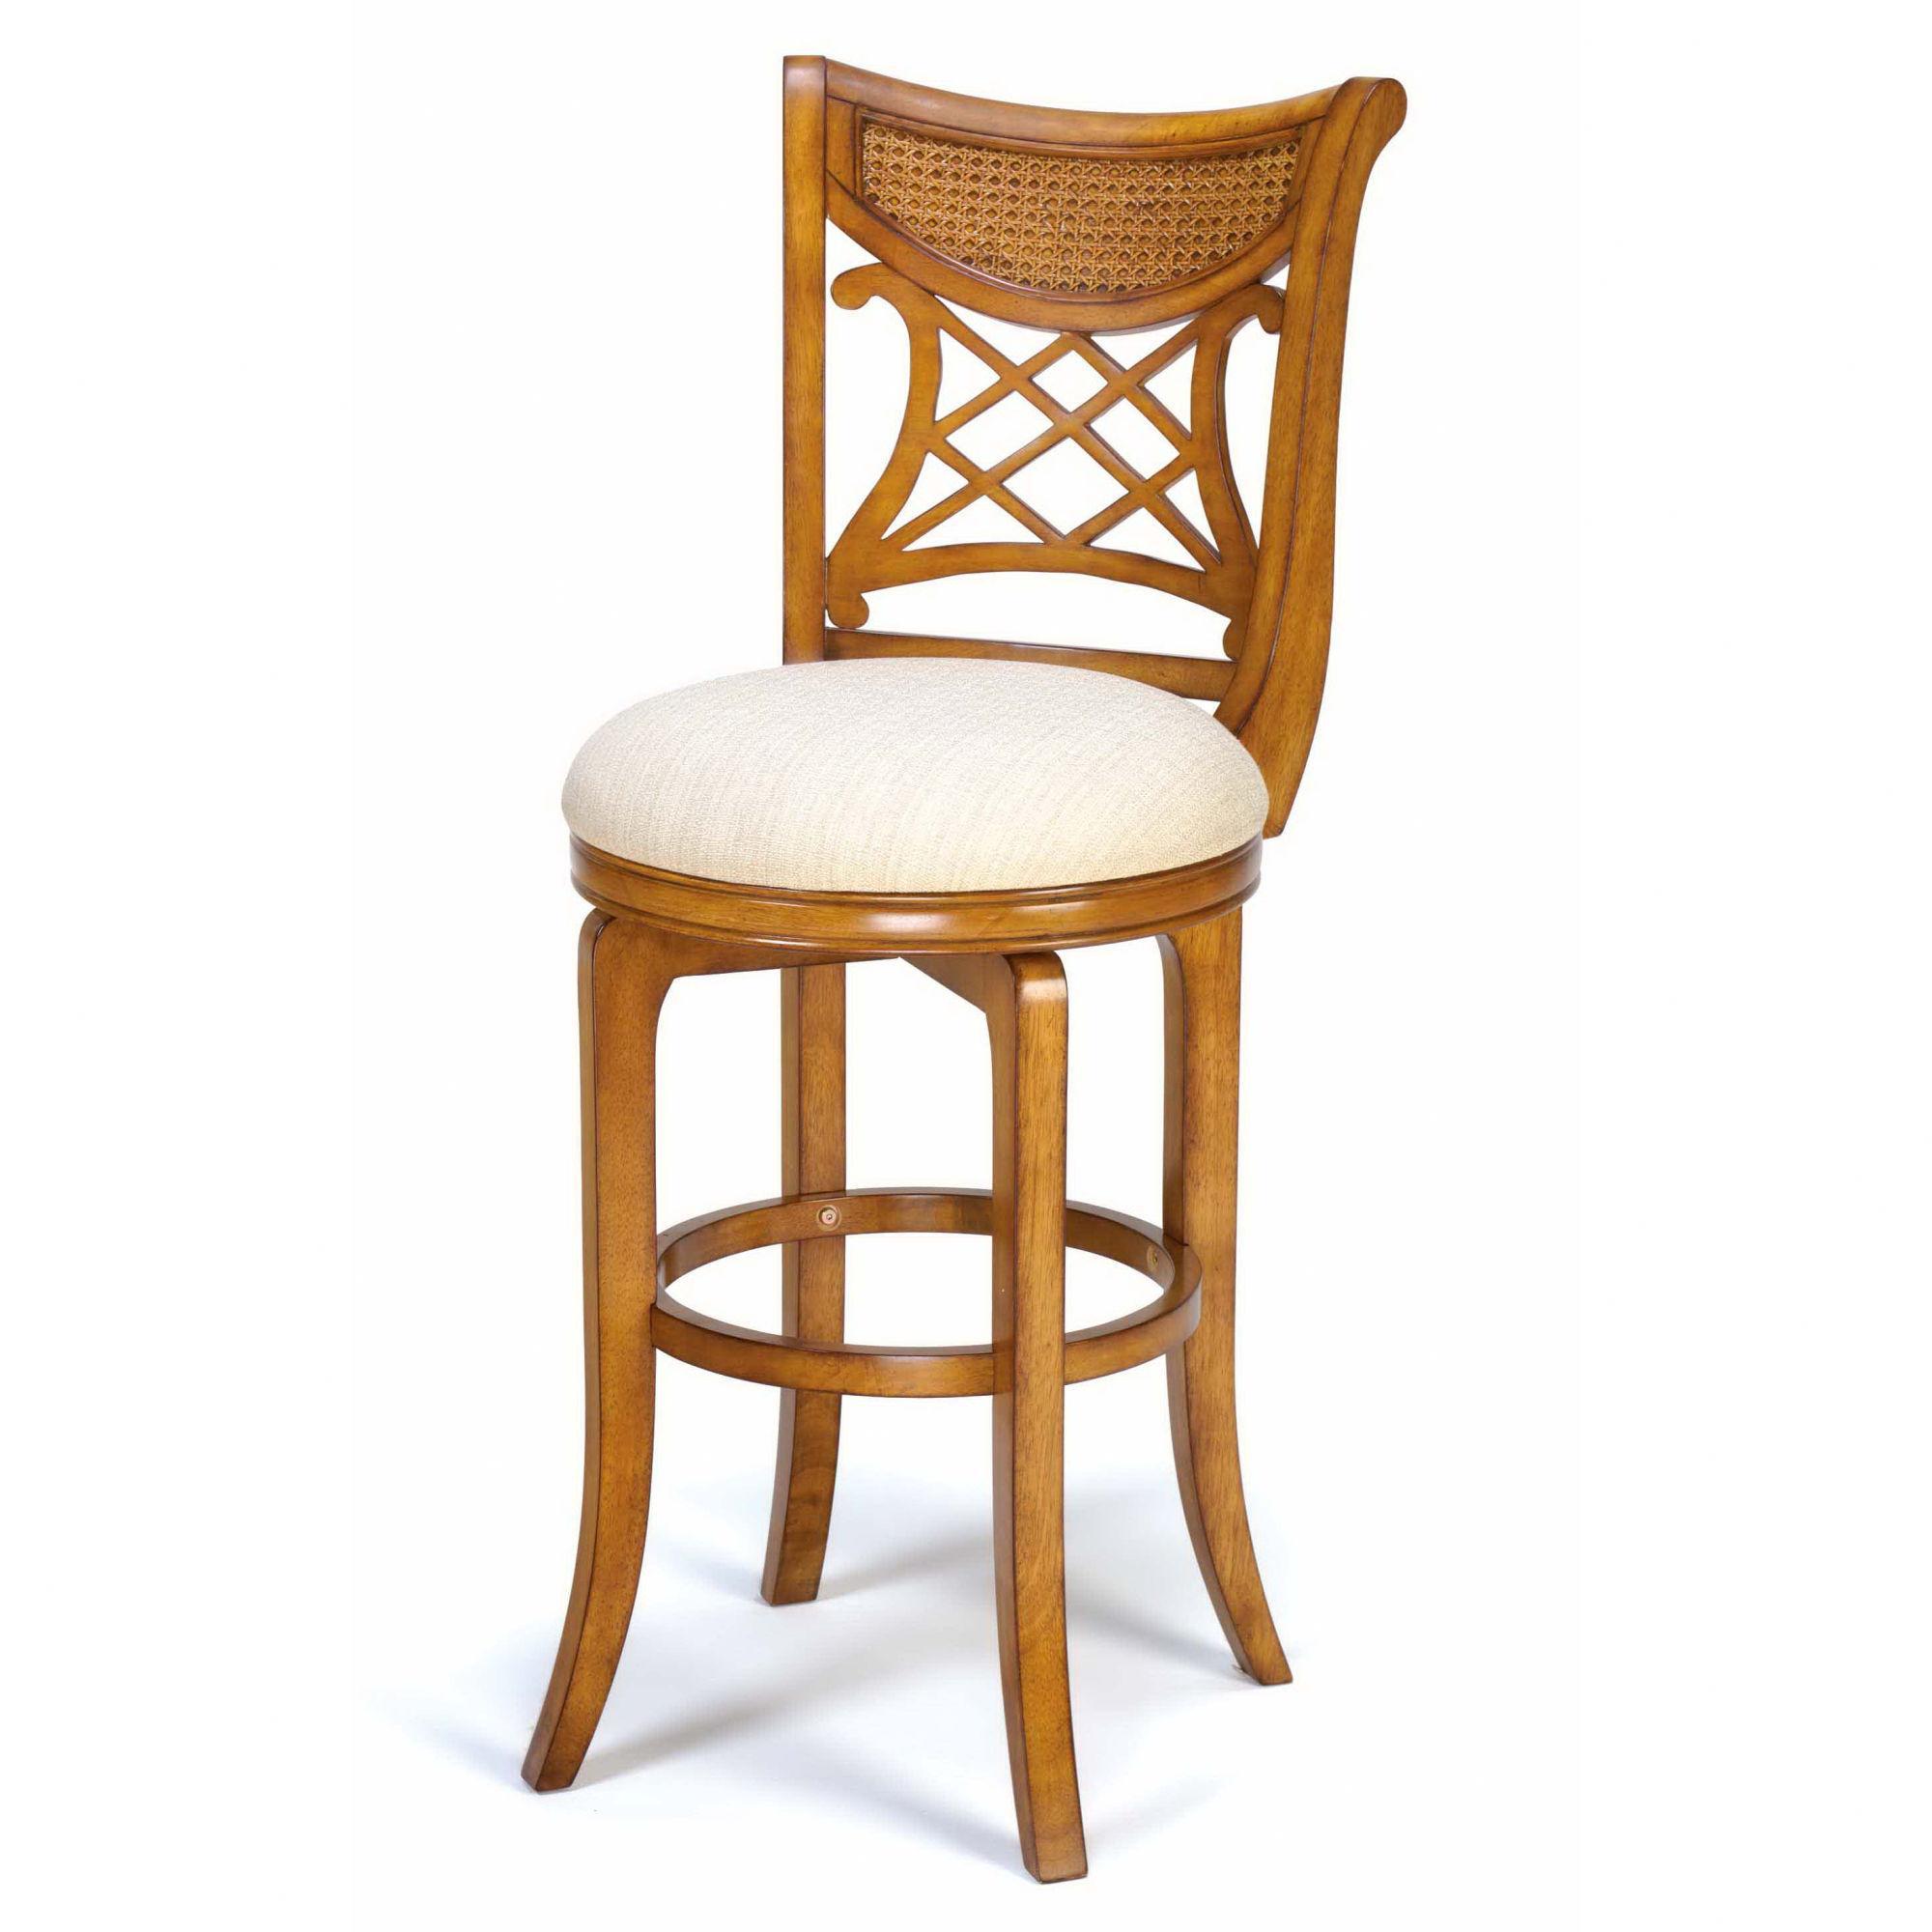 Swivel kitchen stools Photo - 1